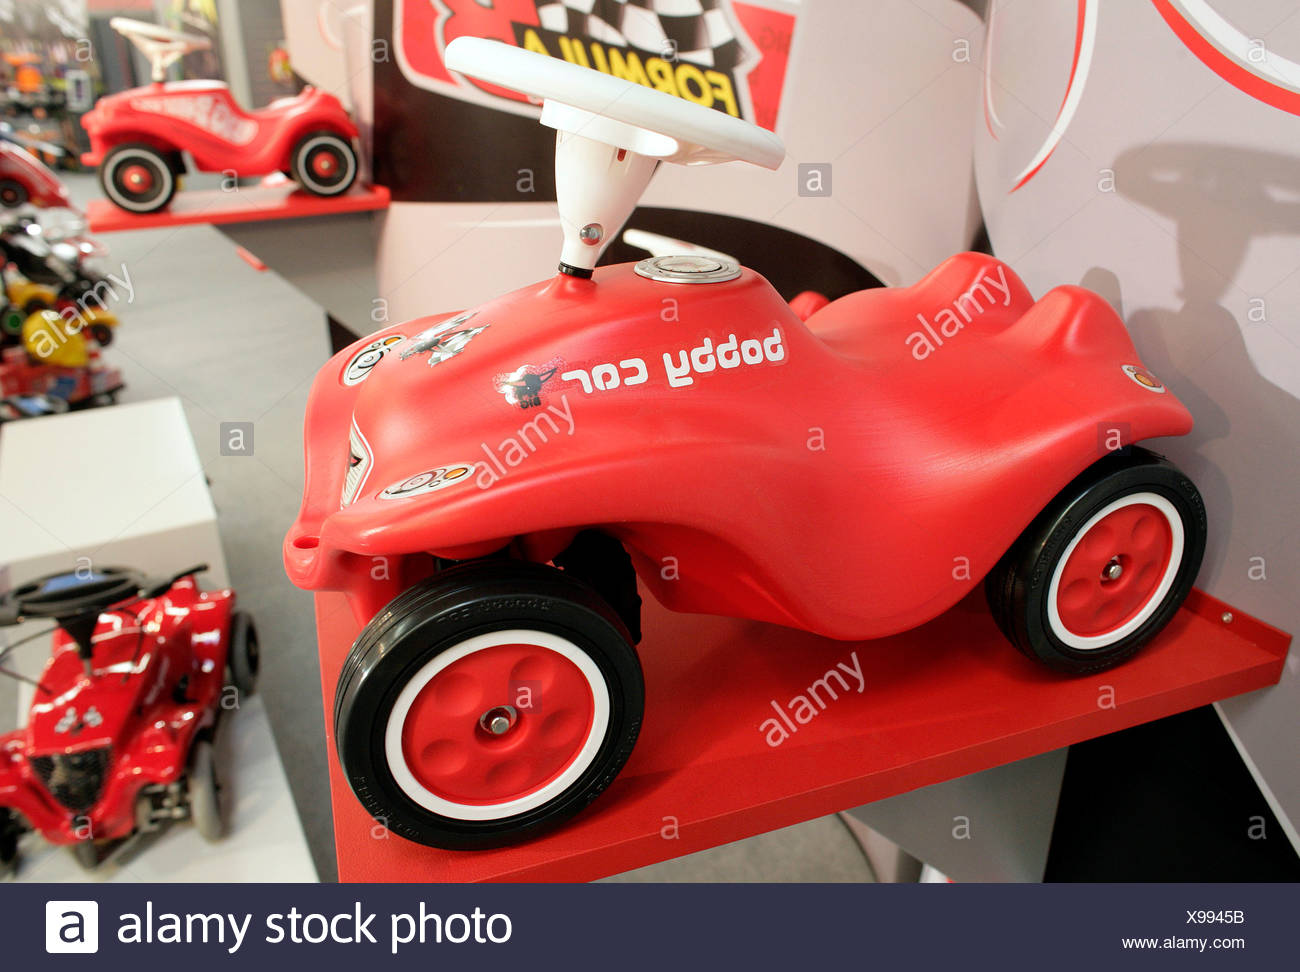 Das legendäre Bobby-Car von Big Spielwarenfabrik in Nürnberg International Toy Fair 2006 in Nürnberg, Bayern, Deutschland, Eu Stockbild